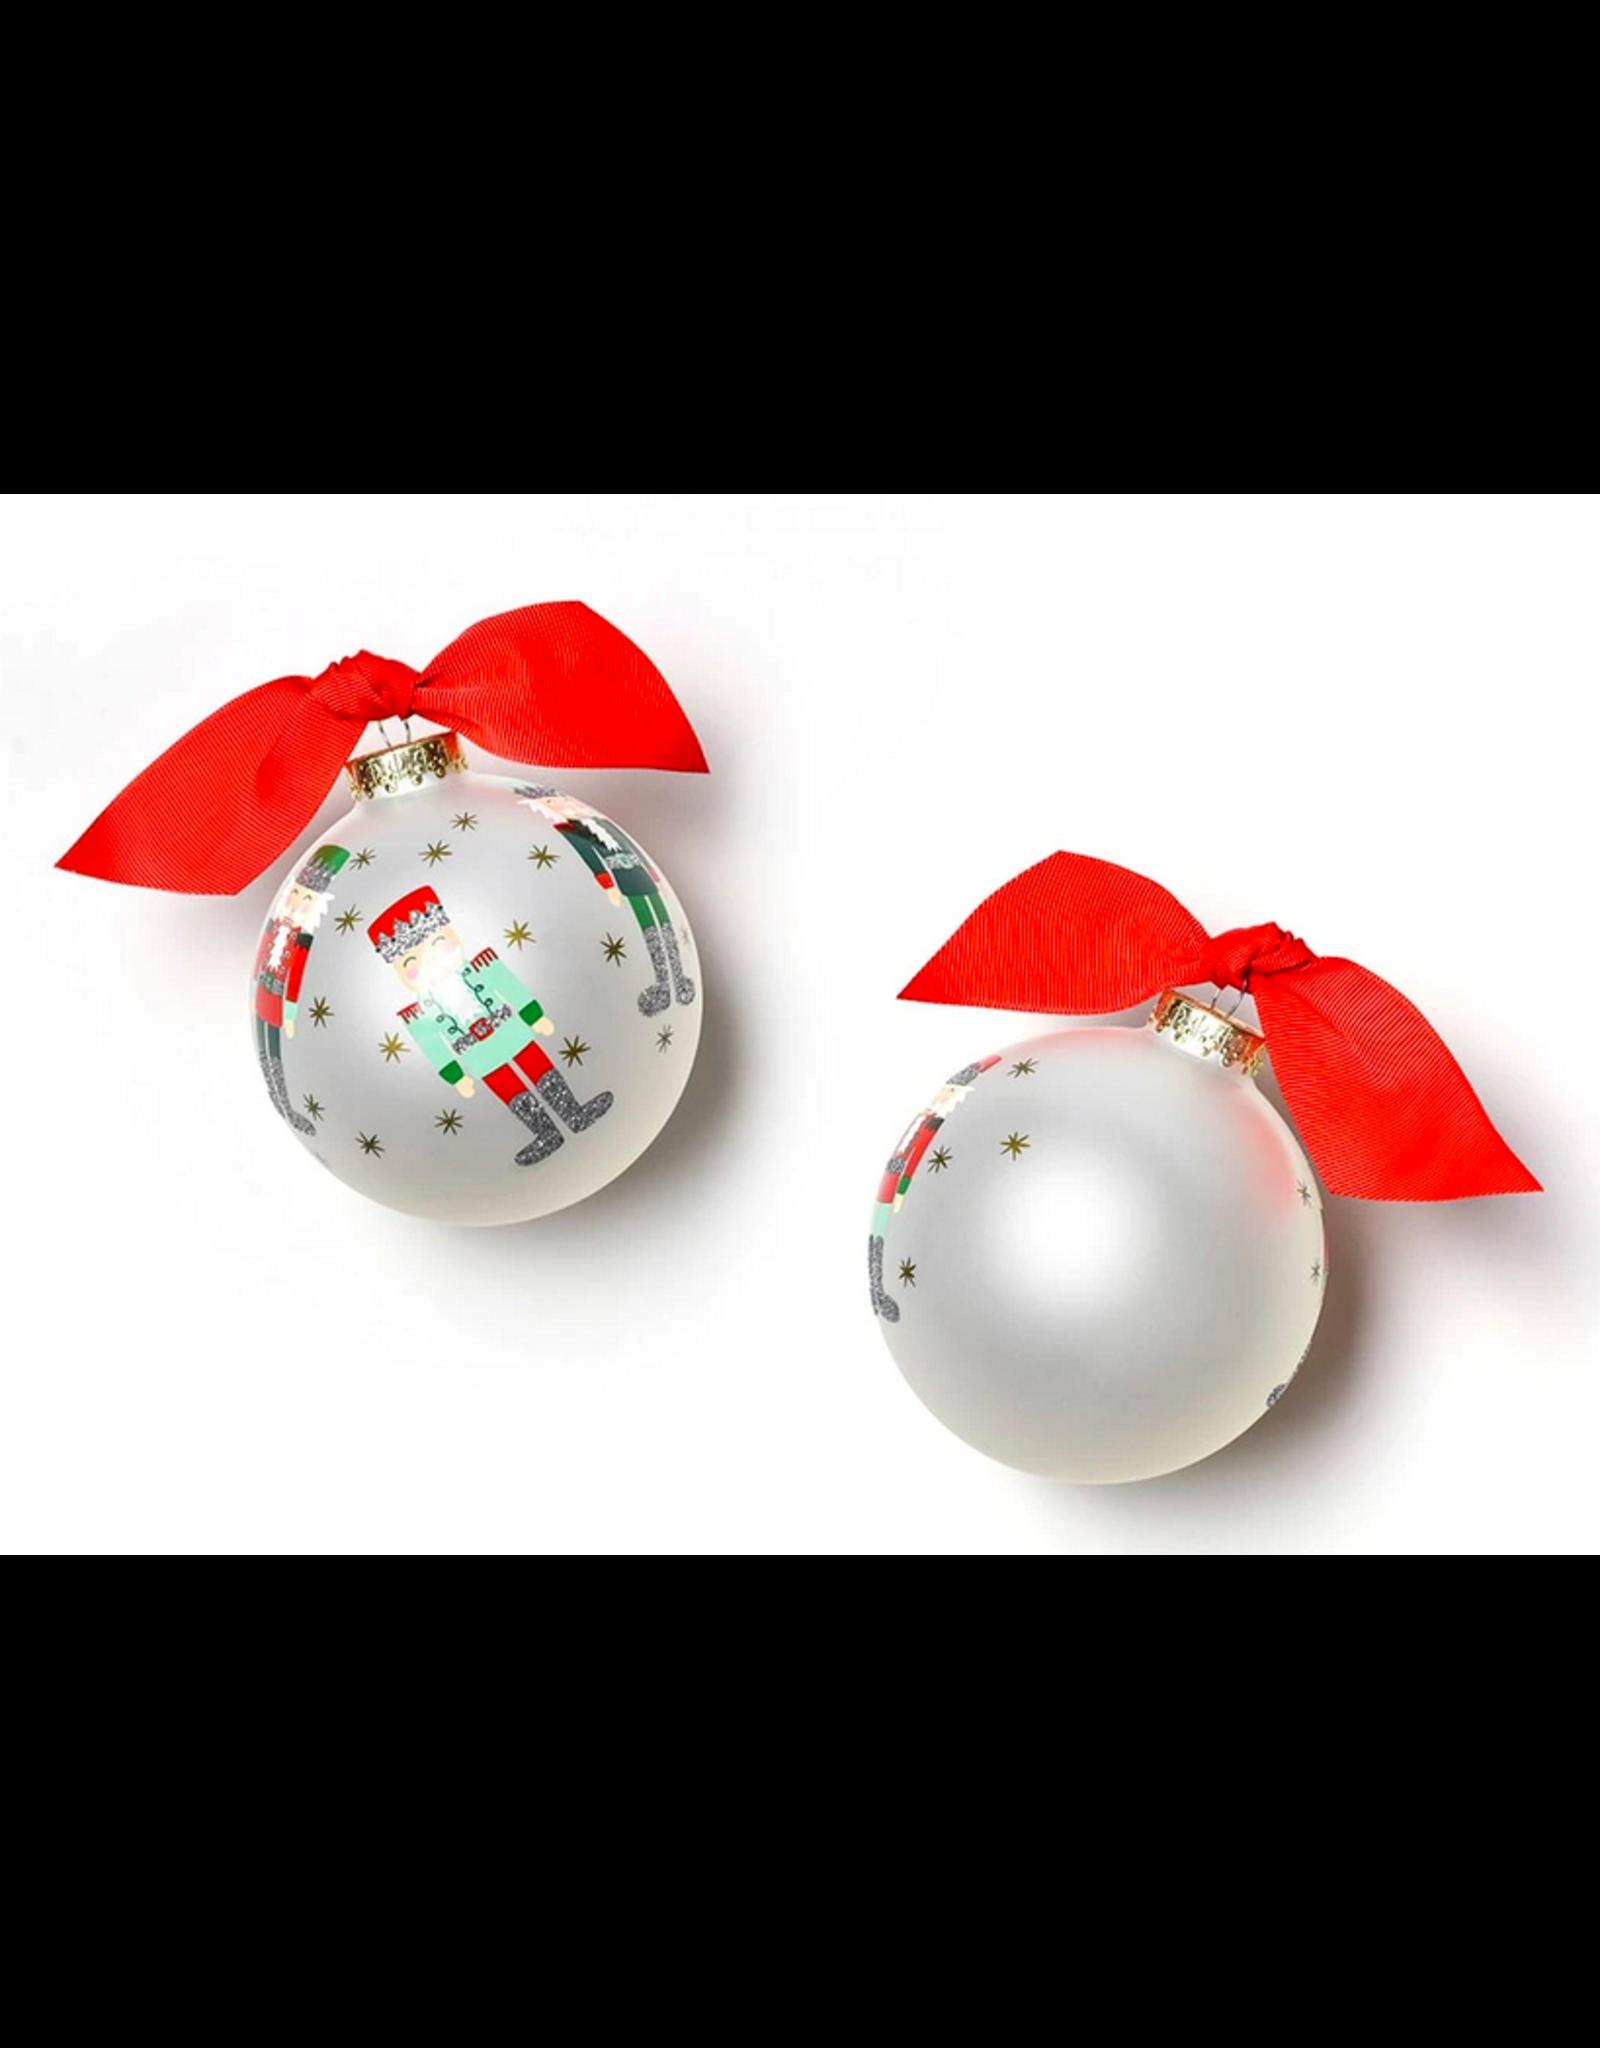 Coton Colors Nutcracker Glass Ornament